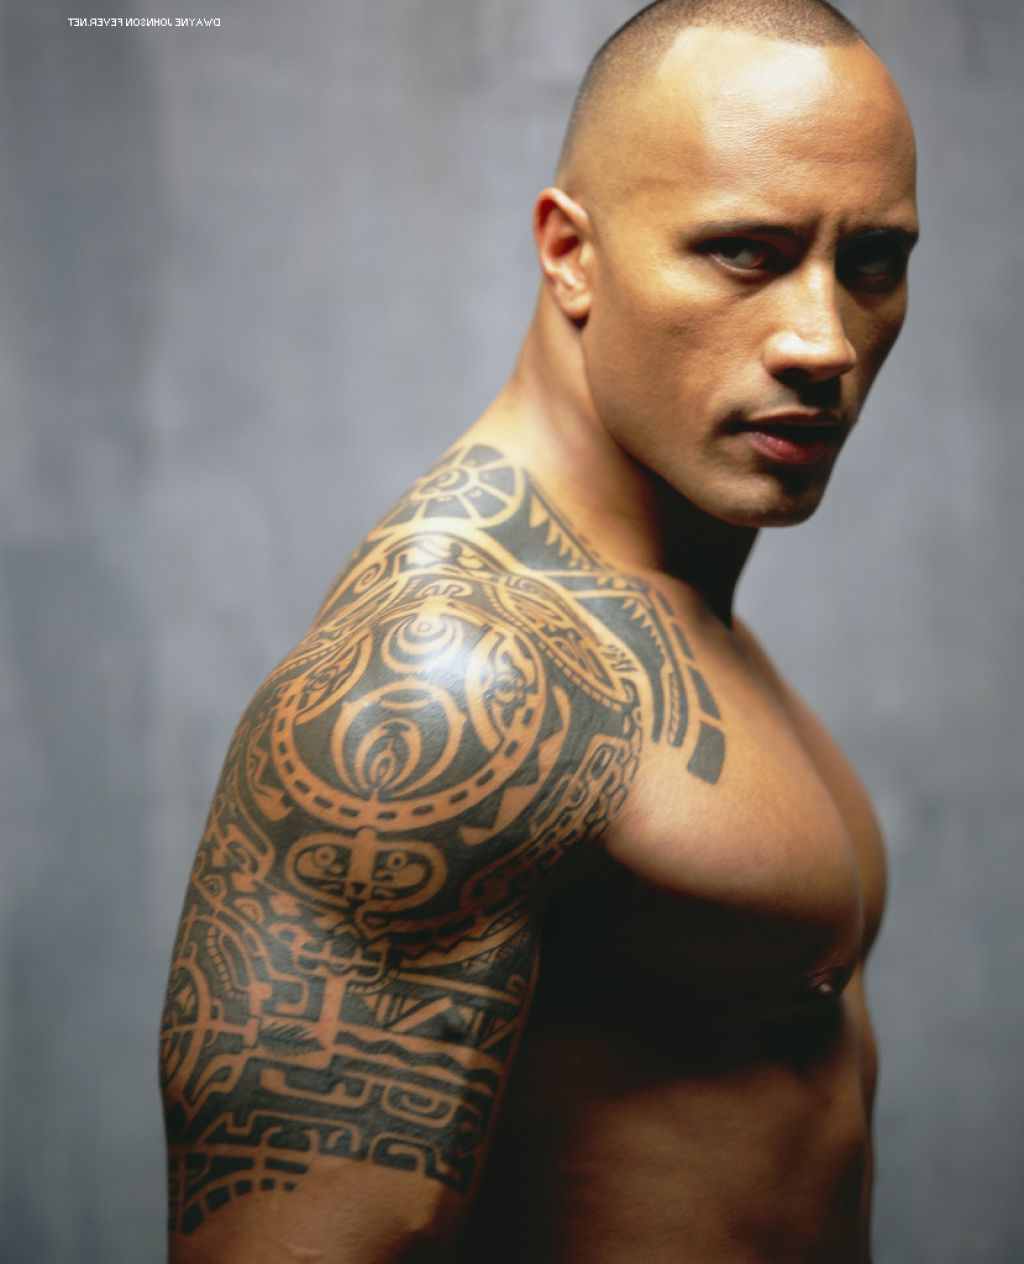 Dwayne johnson tattoo tattoo art ideas celebrity